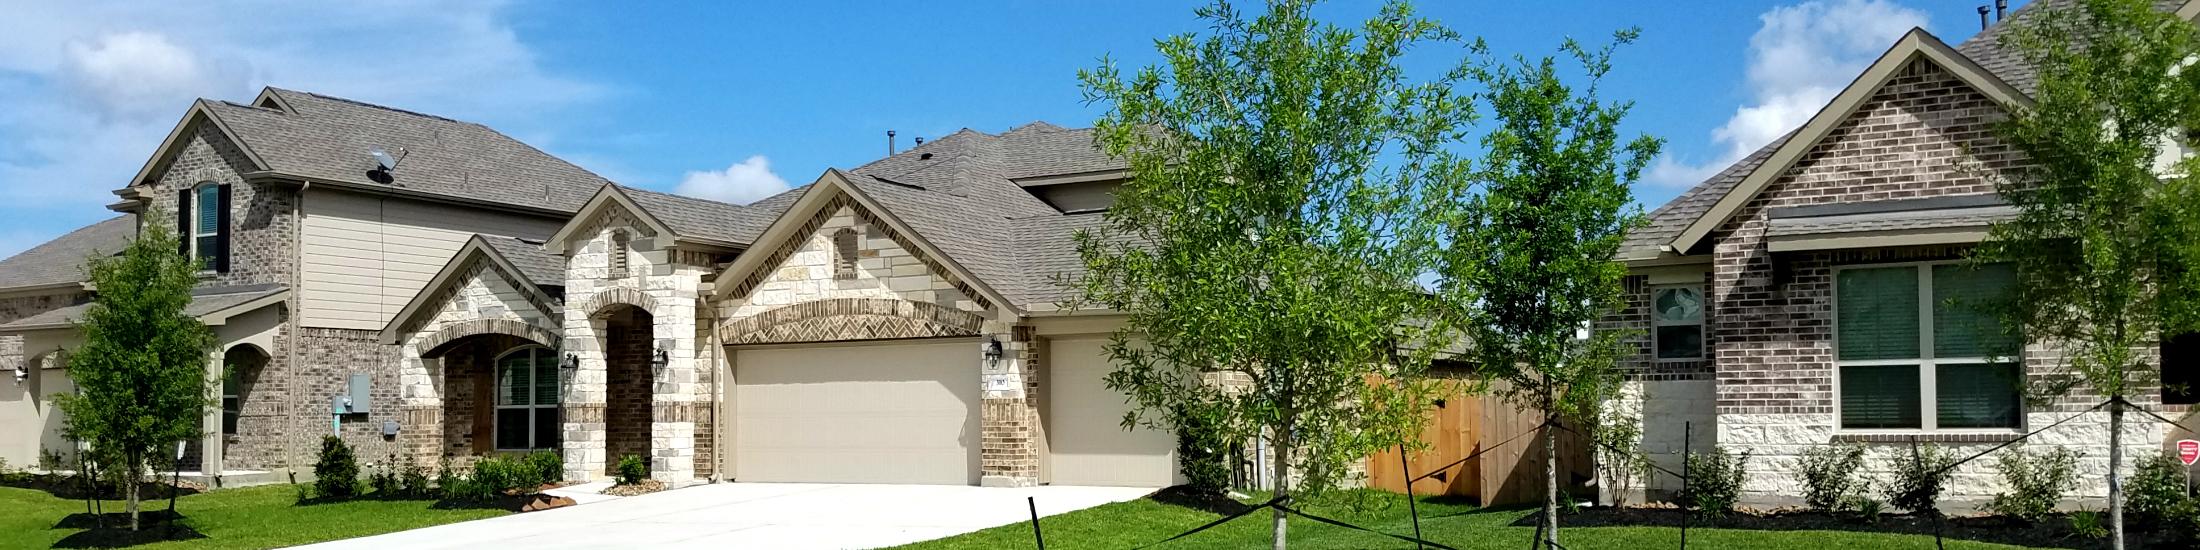 Advanced Houston MLS Home Search